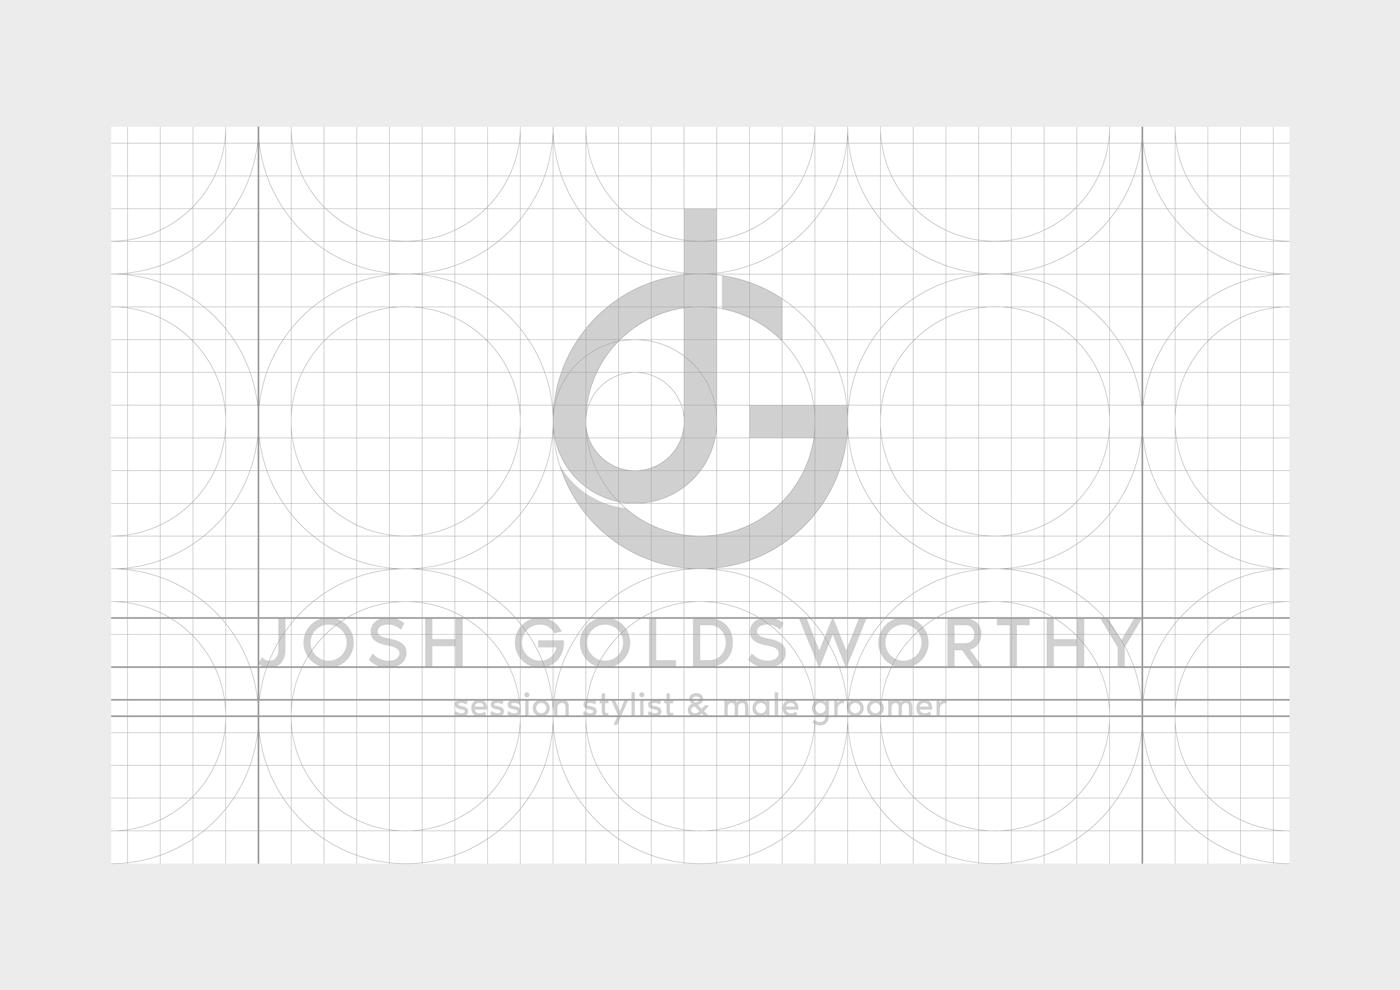 Josh Goldsworthy - Logo geometry